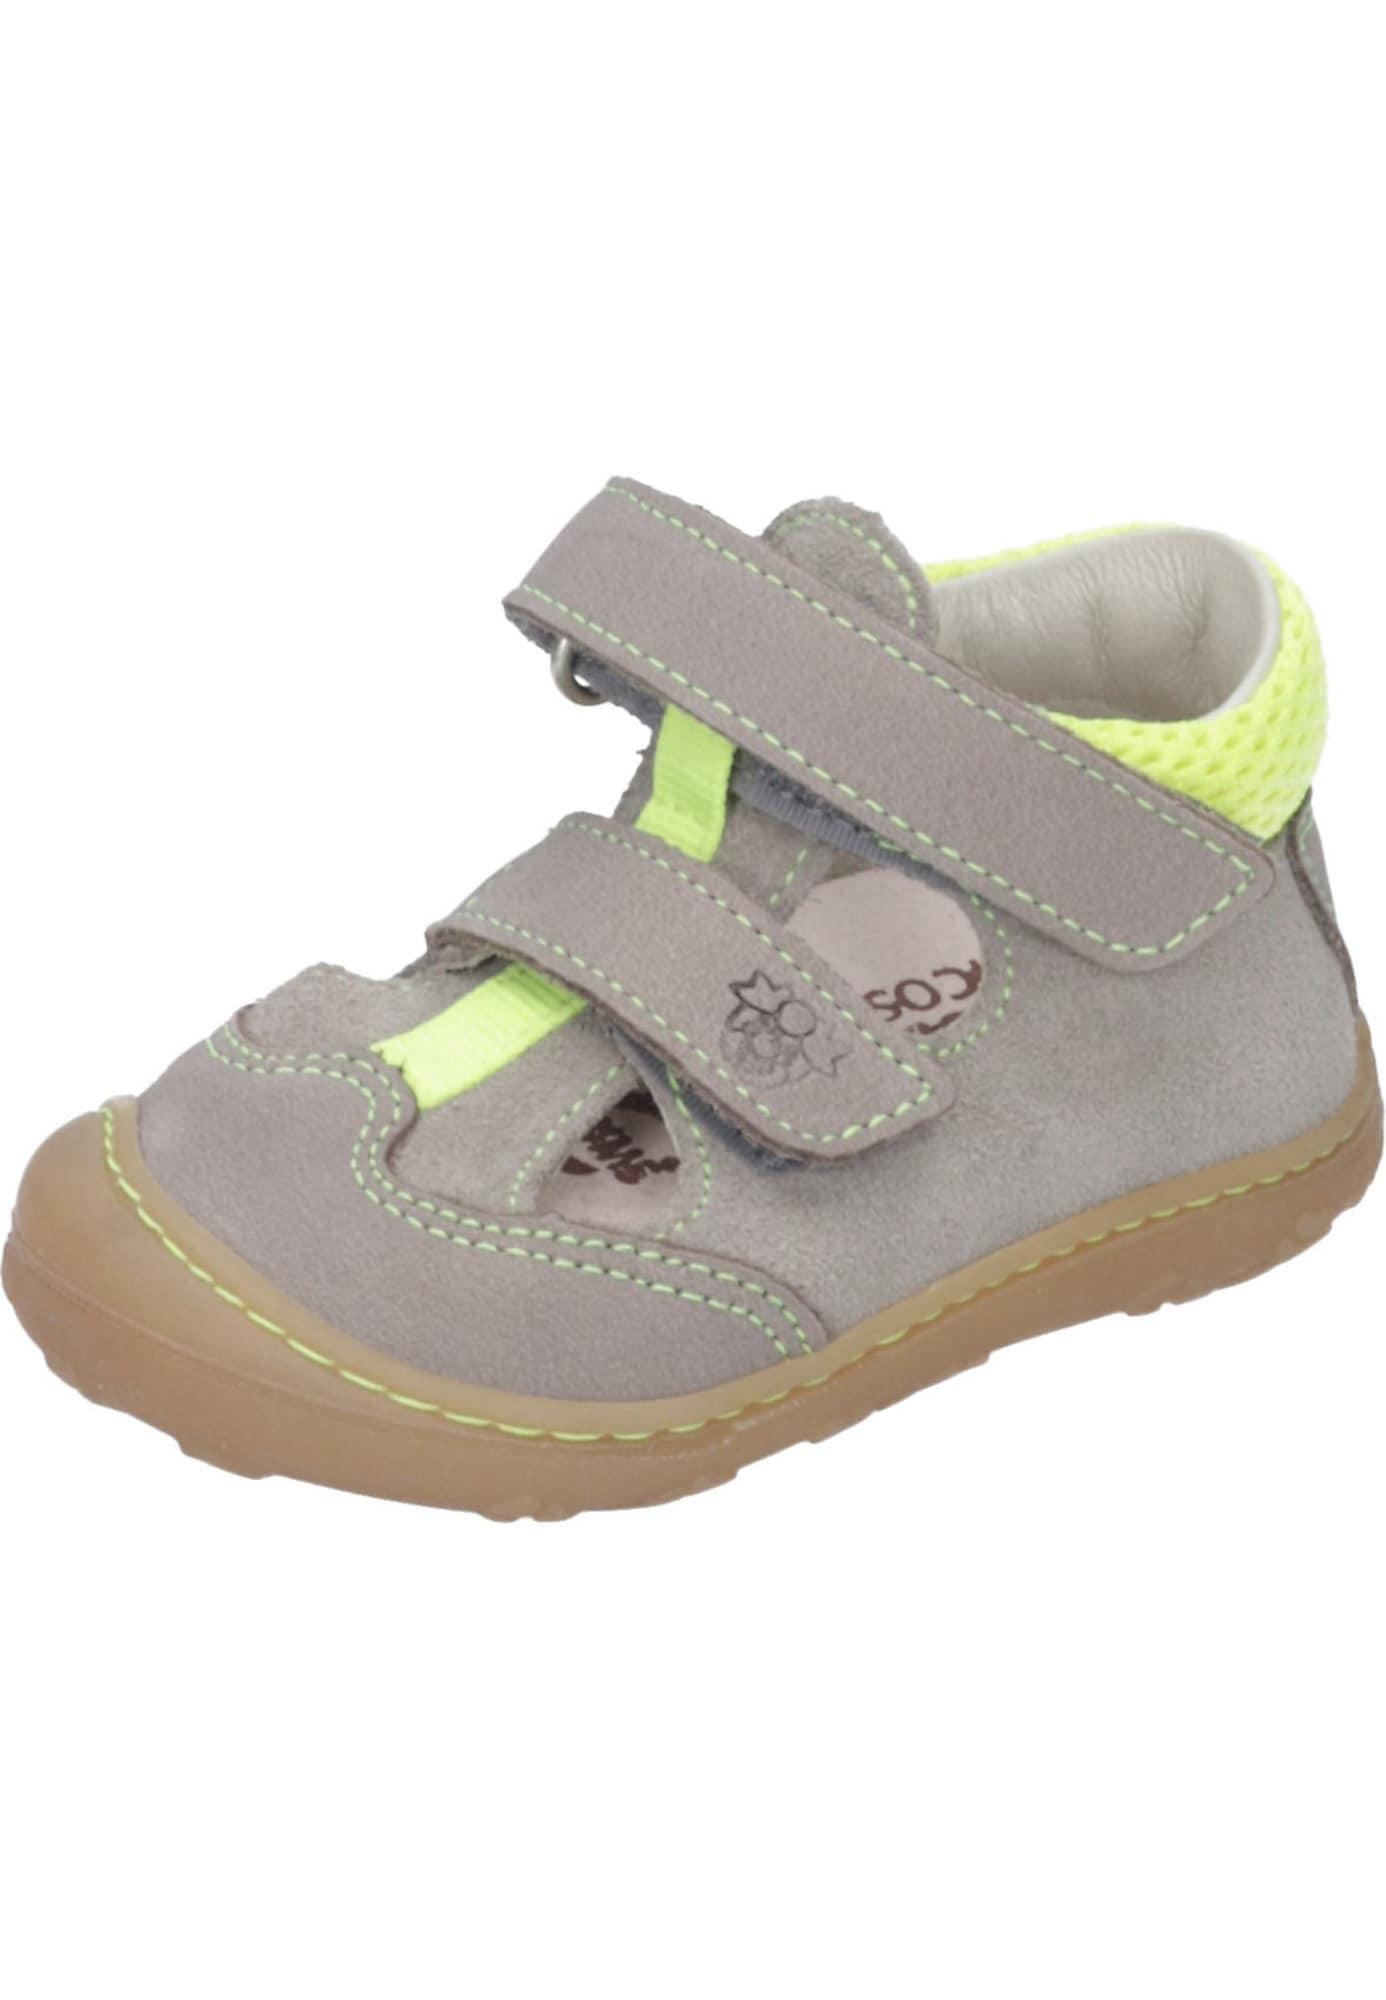 Jungen,  Kinder,  Kinder Pepino Sandale grün, khaki | 04059688370567